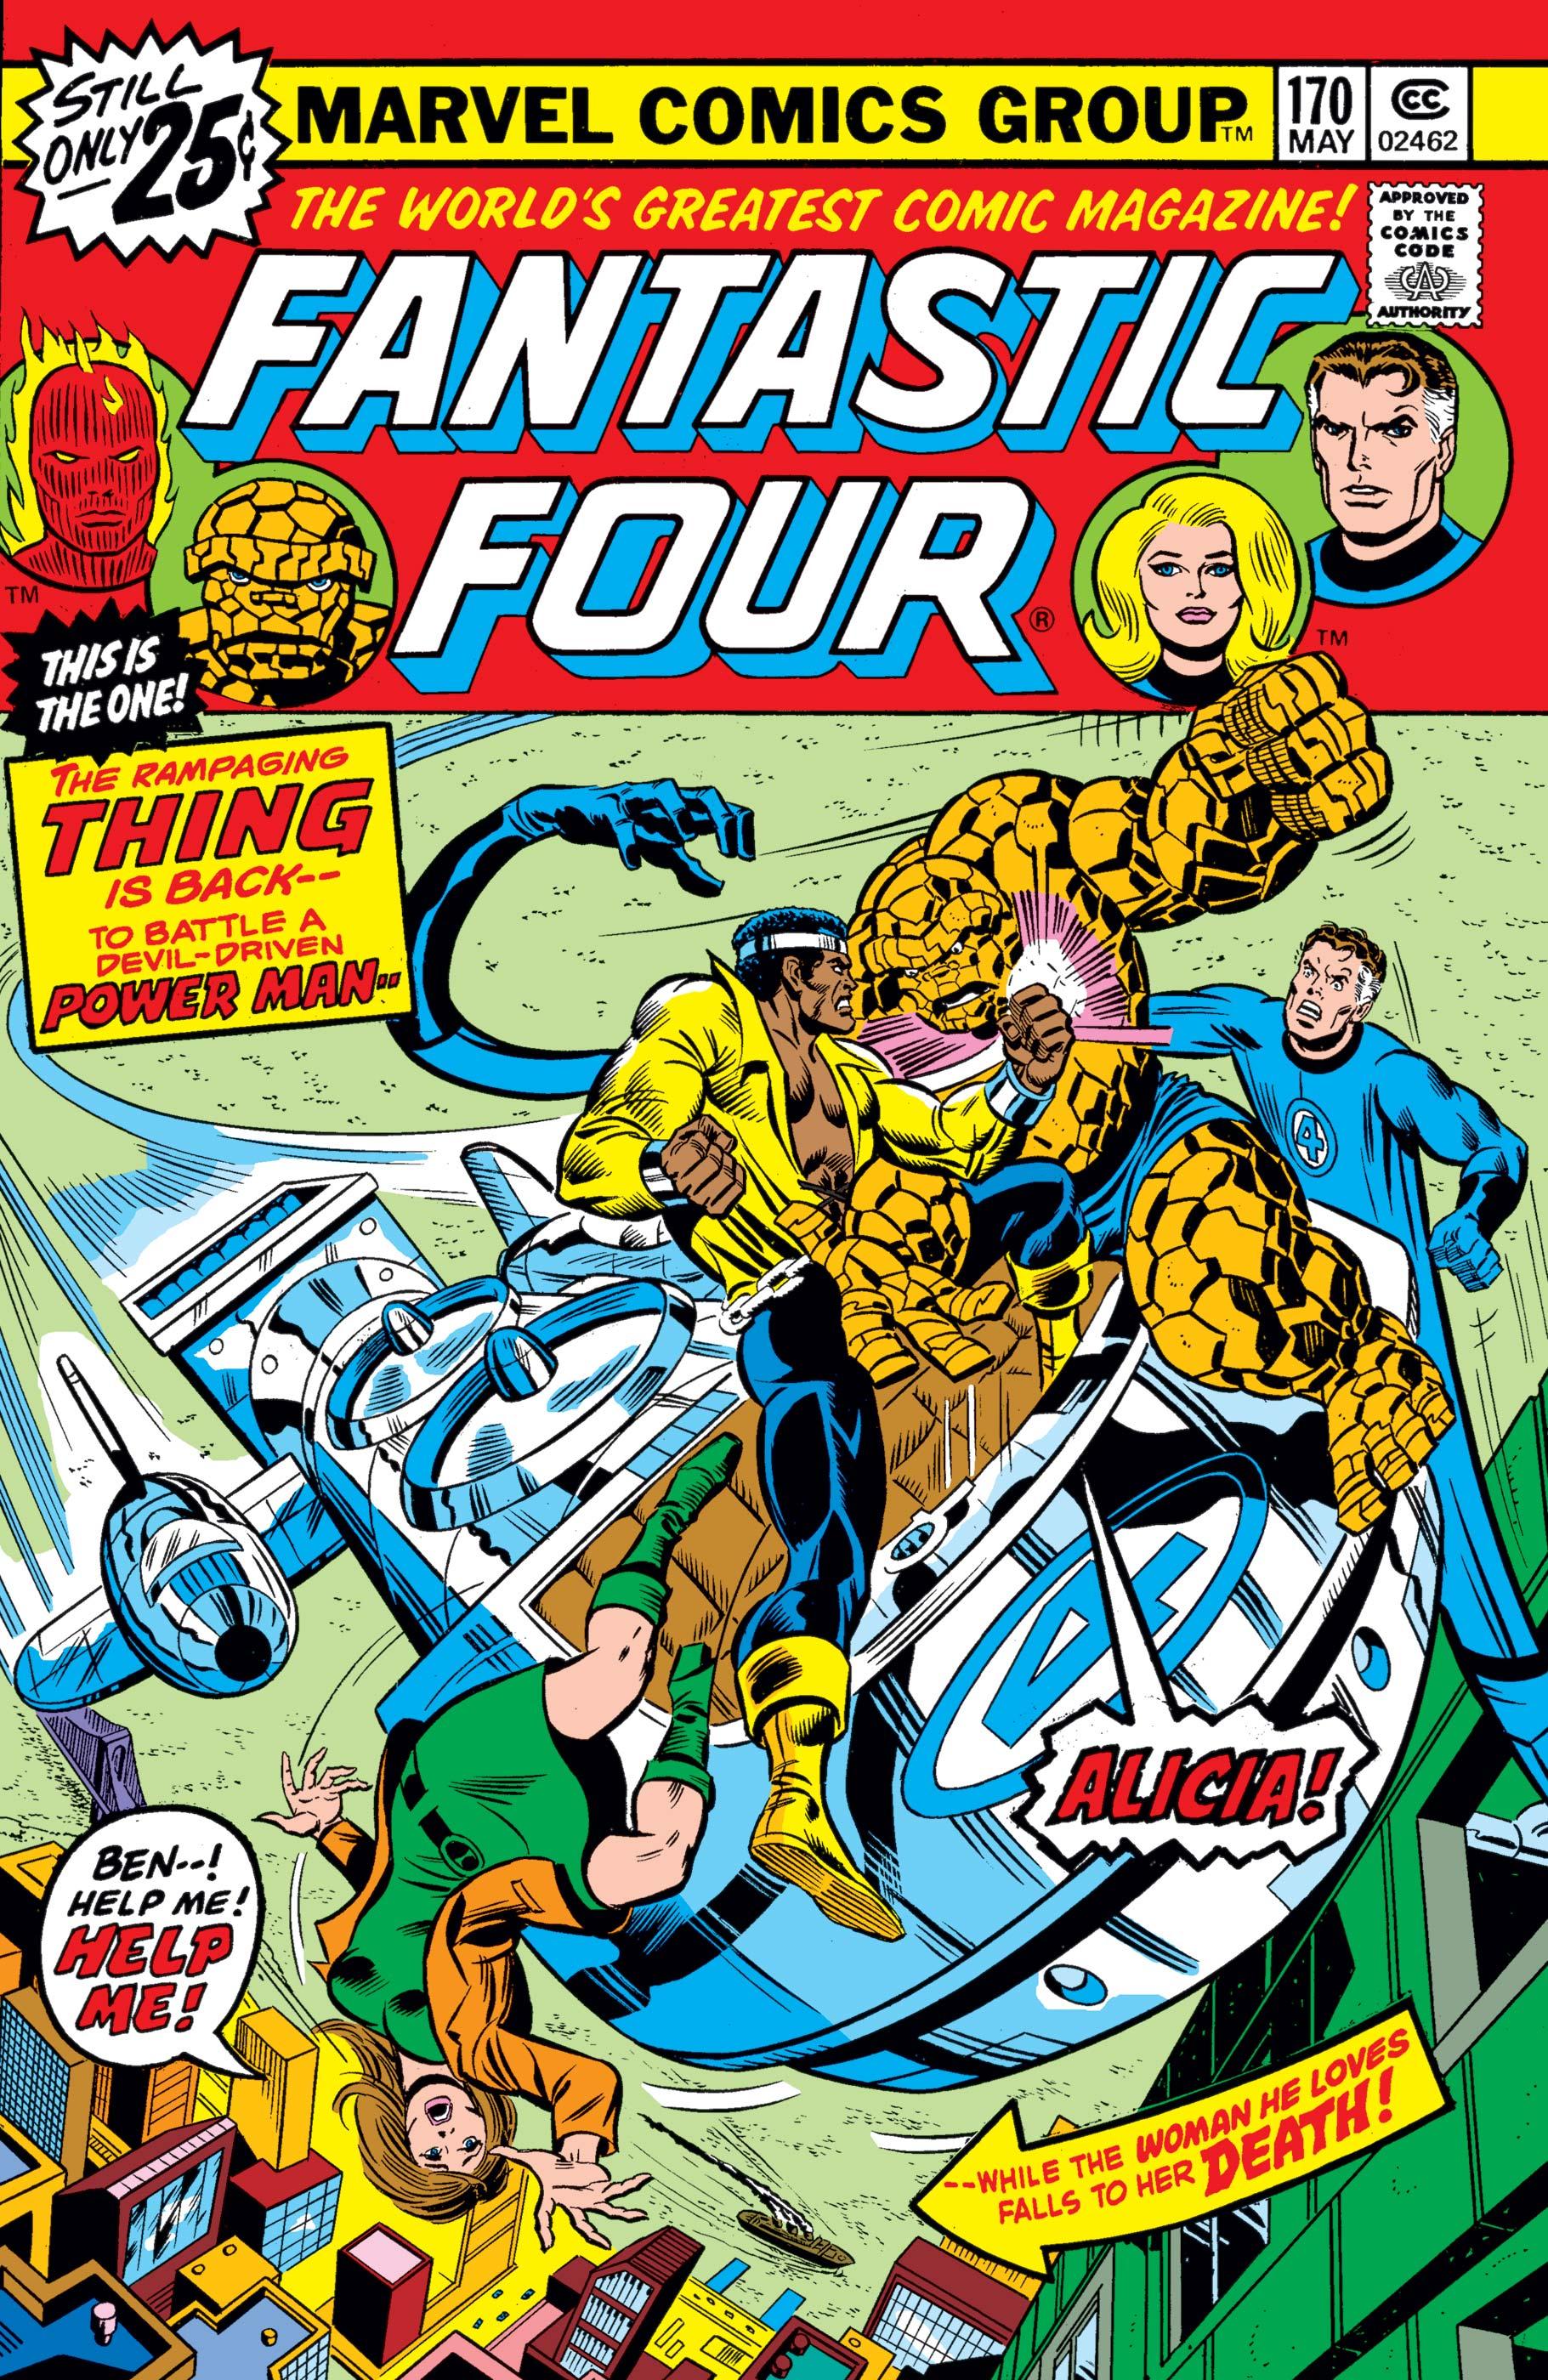 Fantastic Four (1961) #170